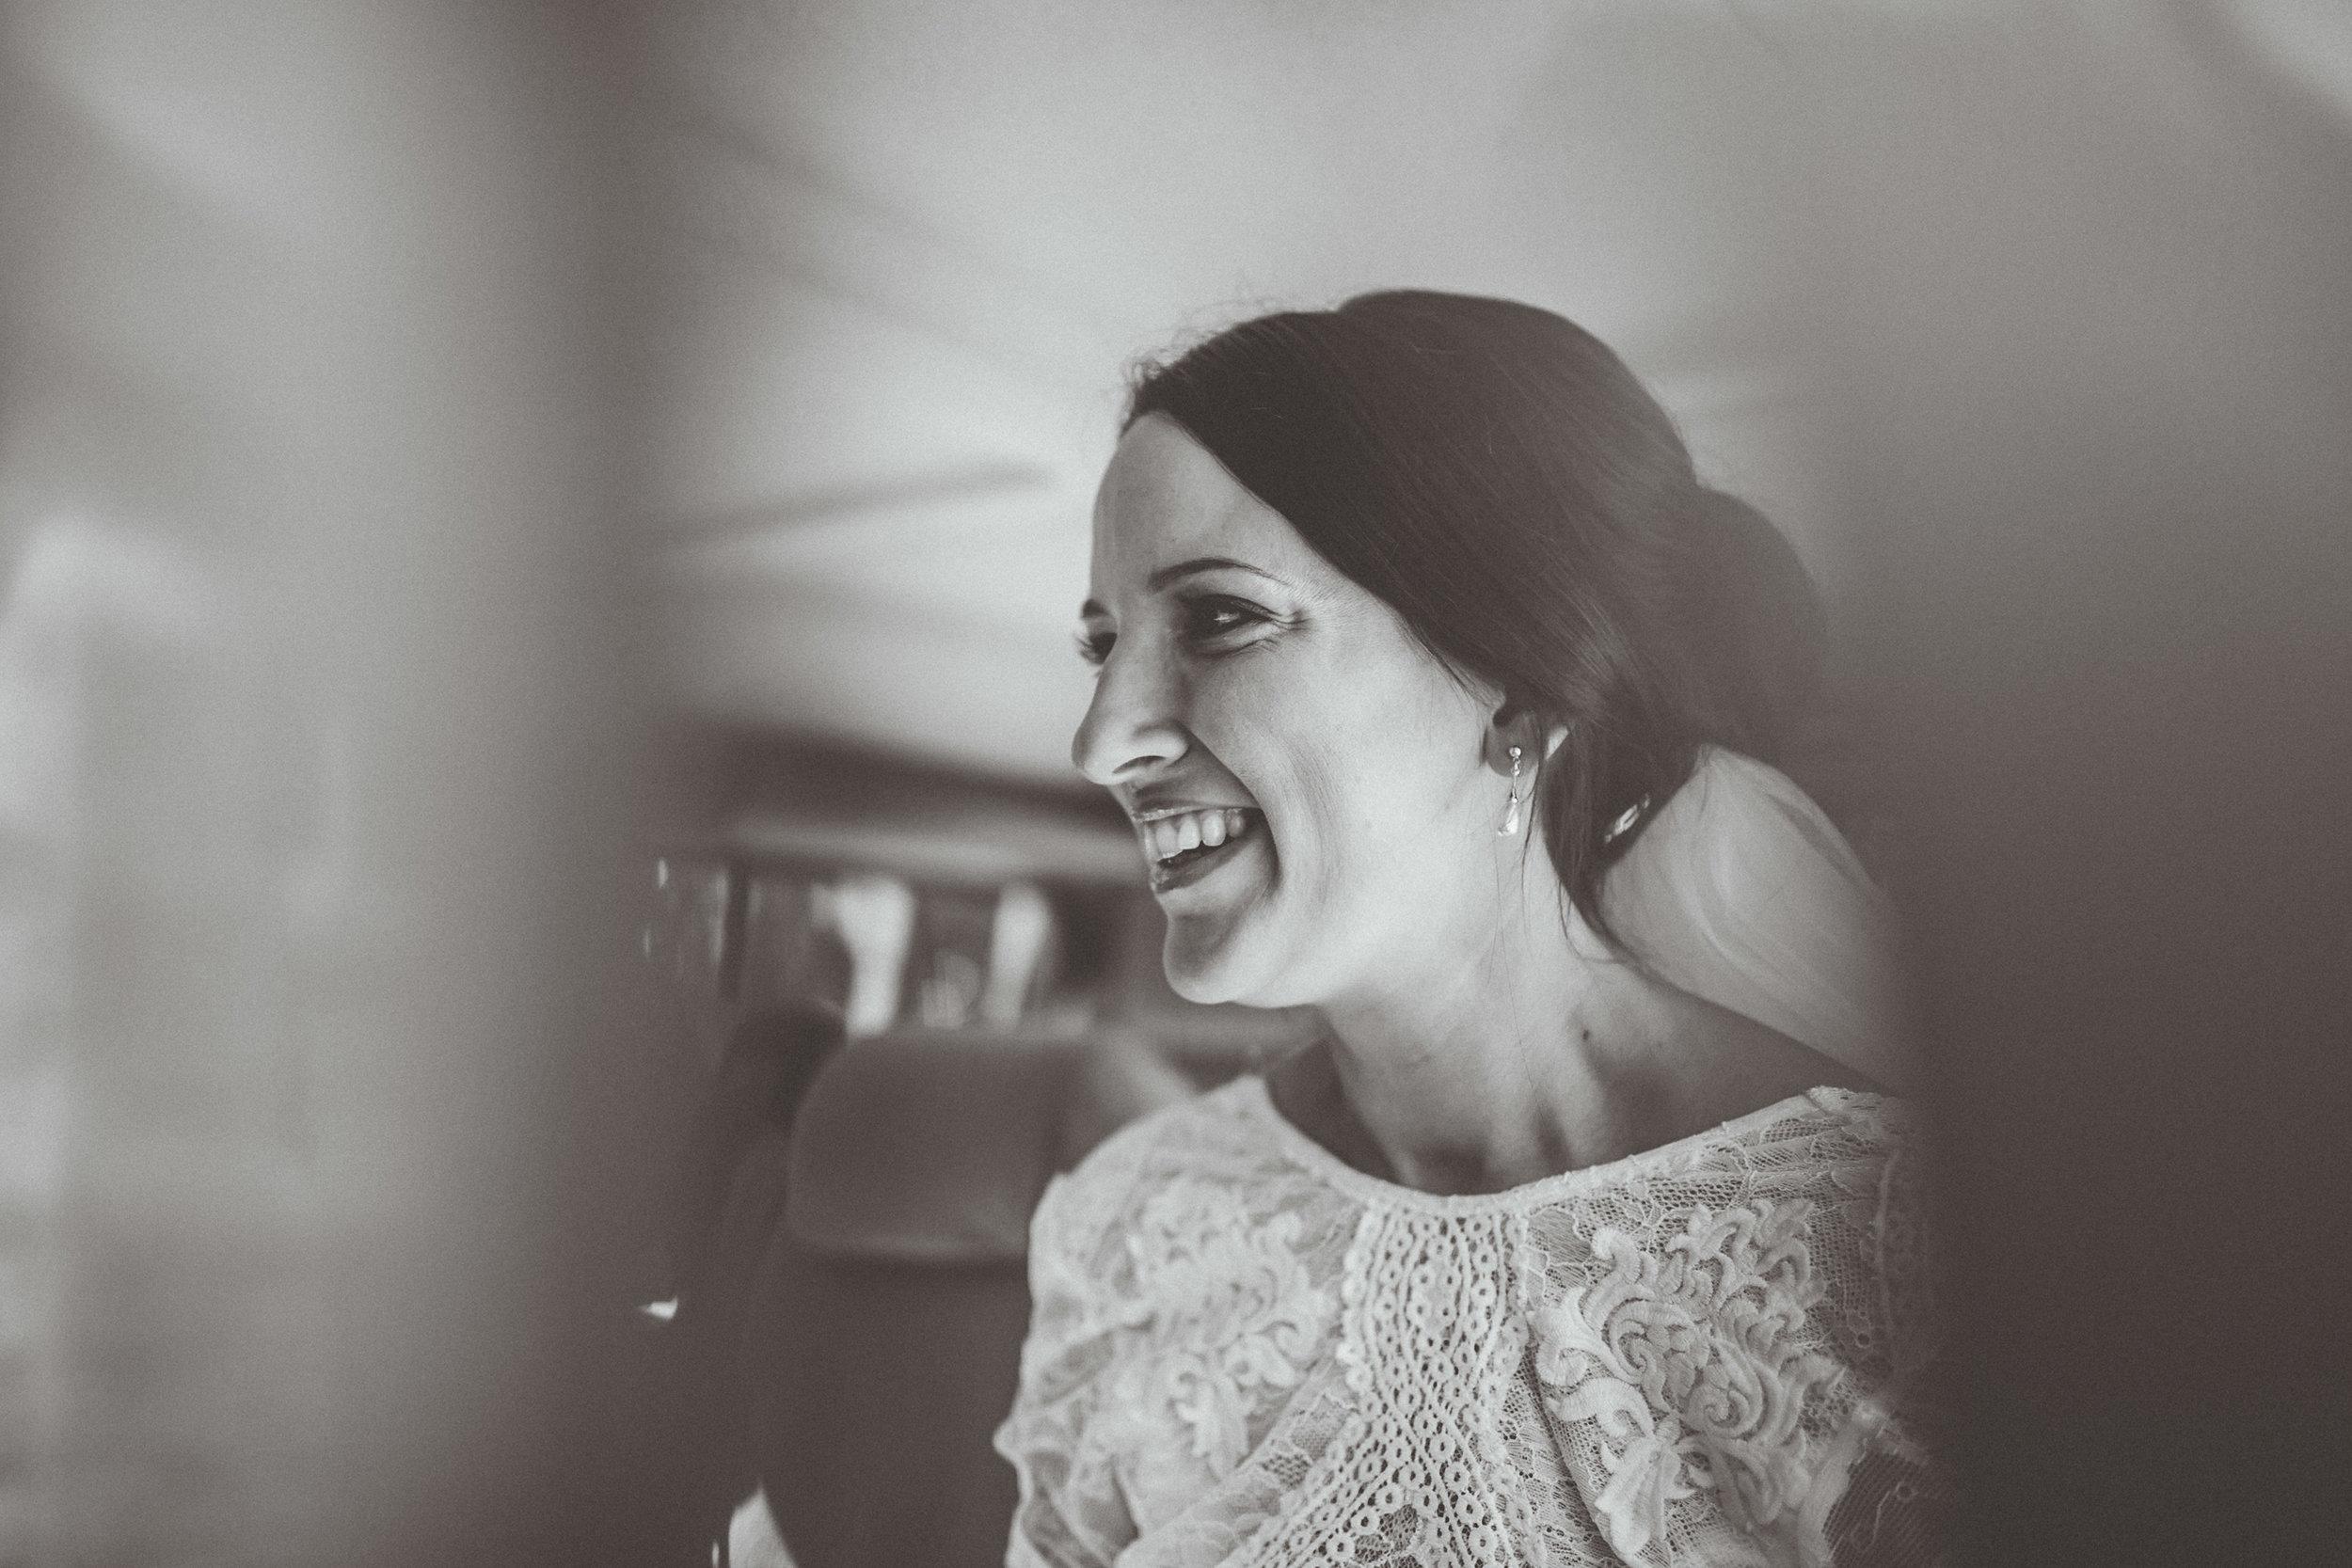 2017.08.28.Rebecca-Jono-Highlights.48._42A9869.jpg